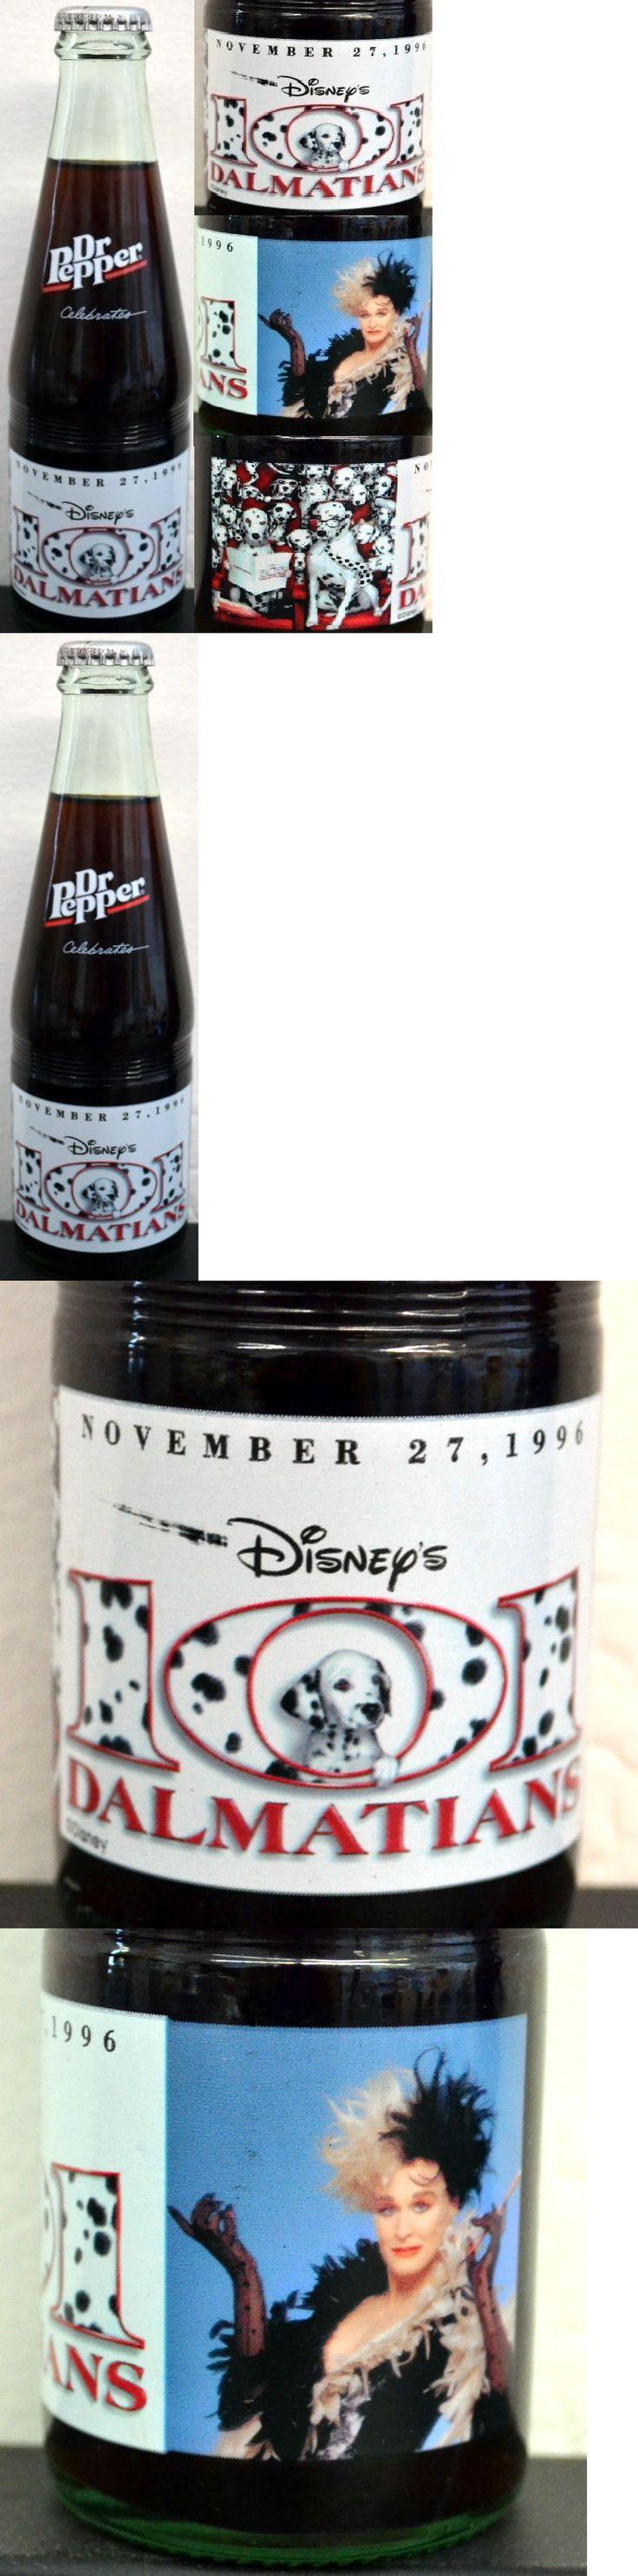 101 Dalmatians 50308: Rare 101 Dalmations Movie Premiere Dr Pepper Bottle - Glenn Close - Disney Htf+ -> BUY IT NOW ONLY: $47.99 on eBay!